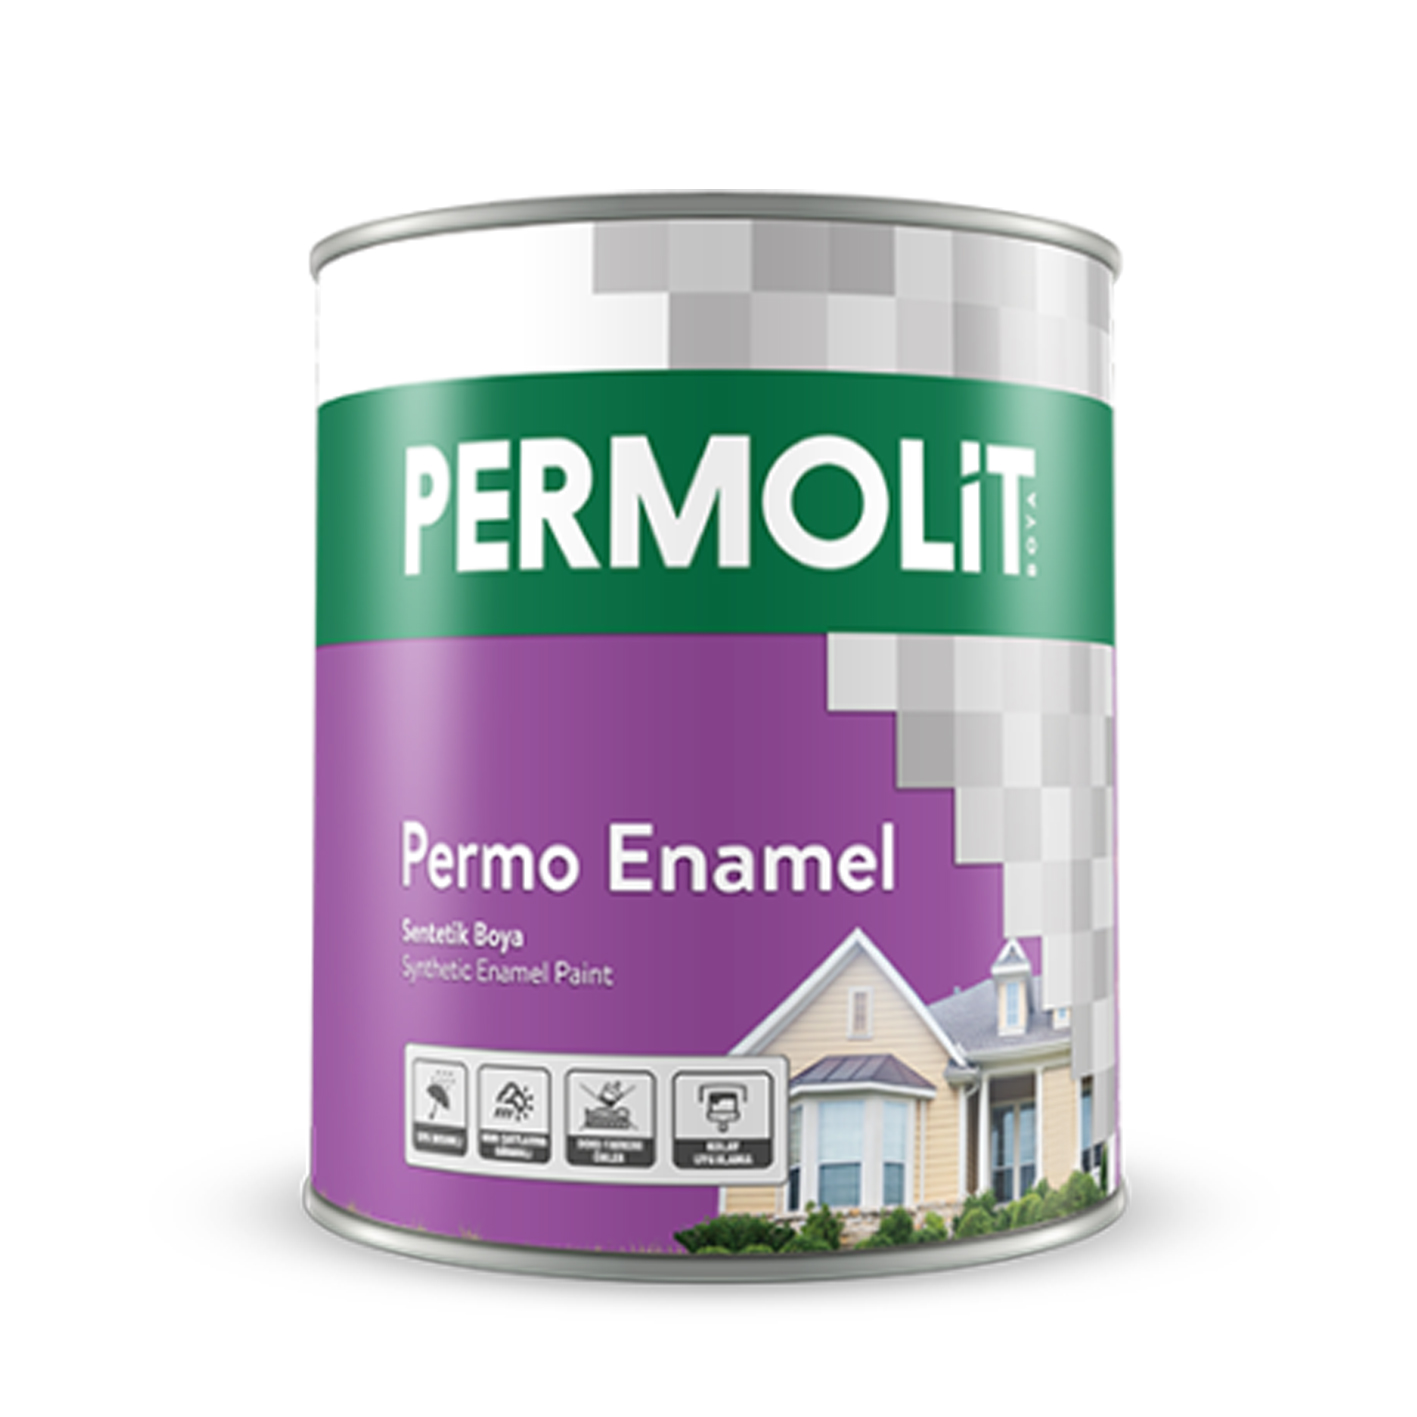 Permolit Permo Enamel Sentetik Lacivert 0.75Lt